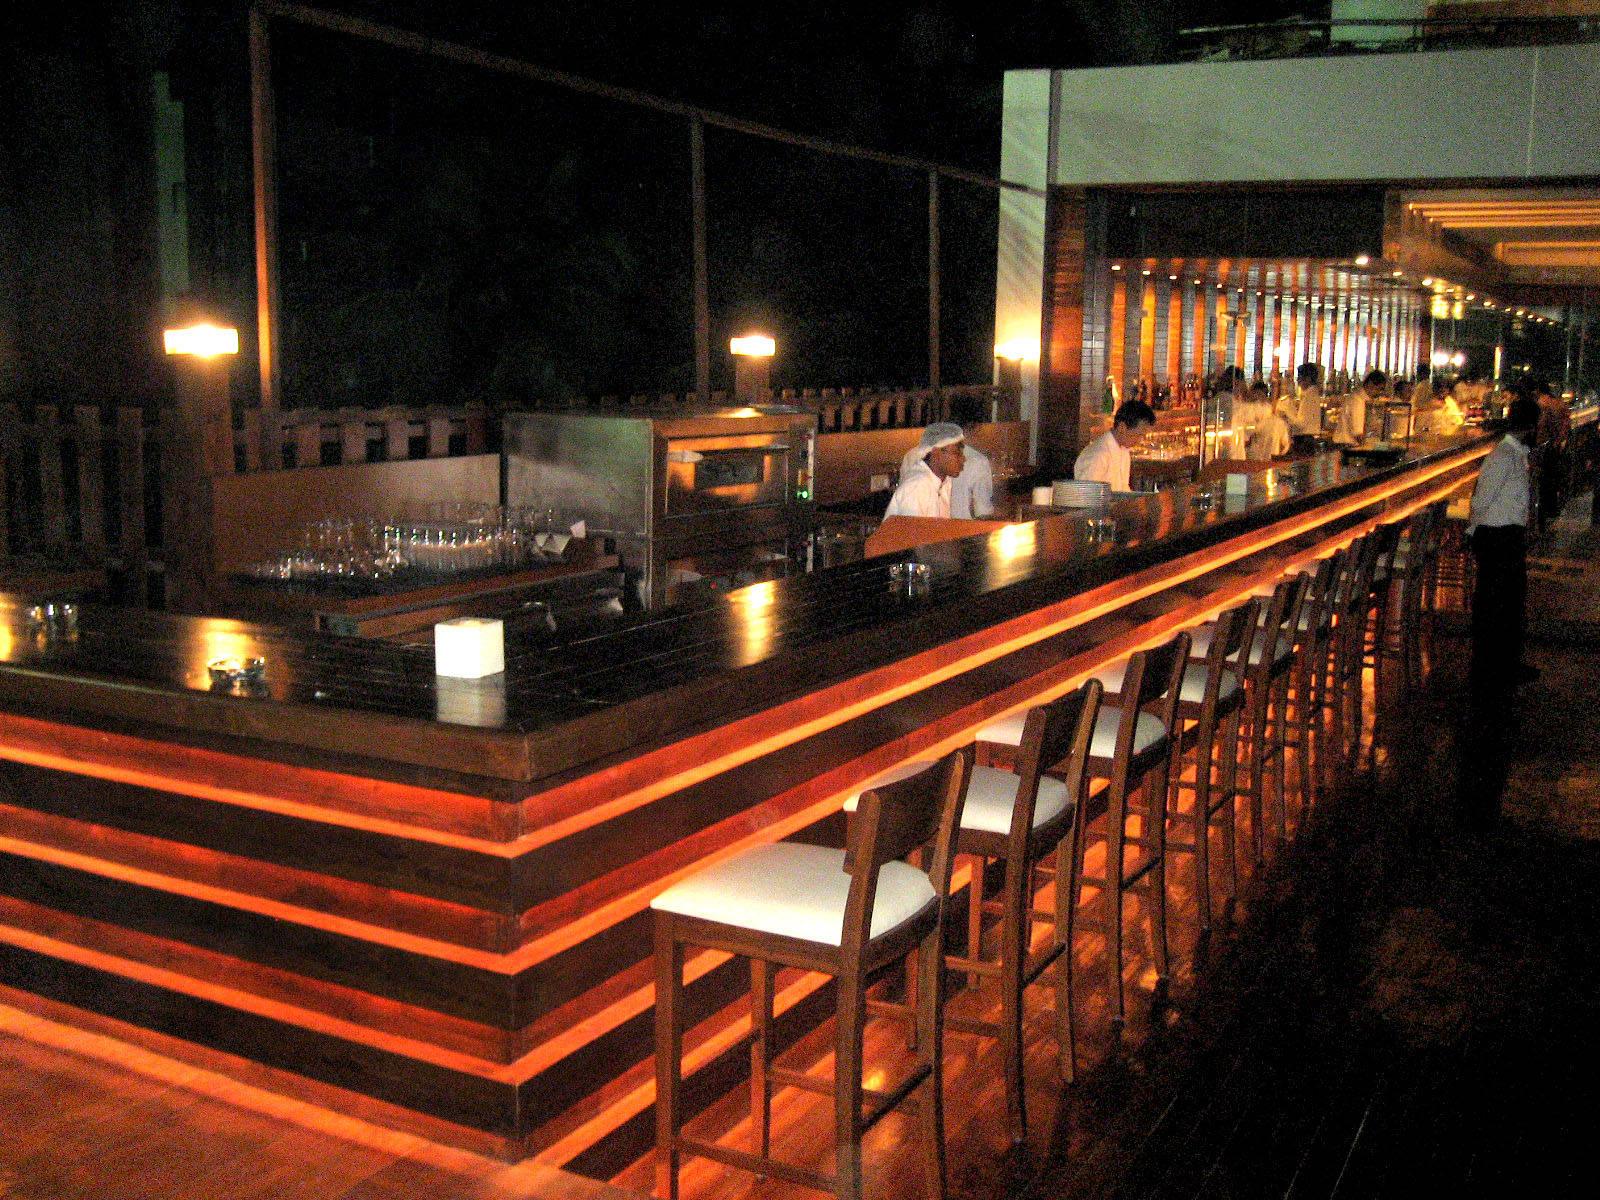 Veit talks bars vs beats for Barras para bar rusticas